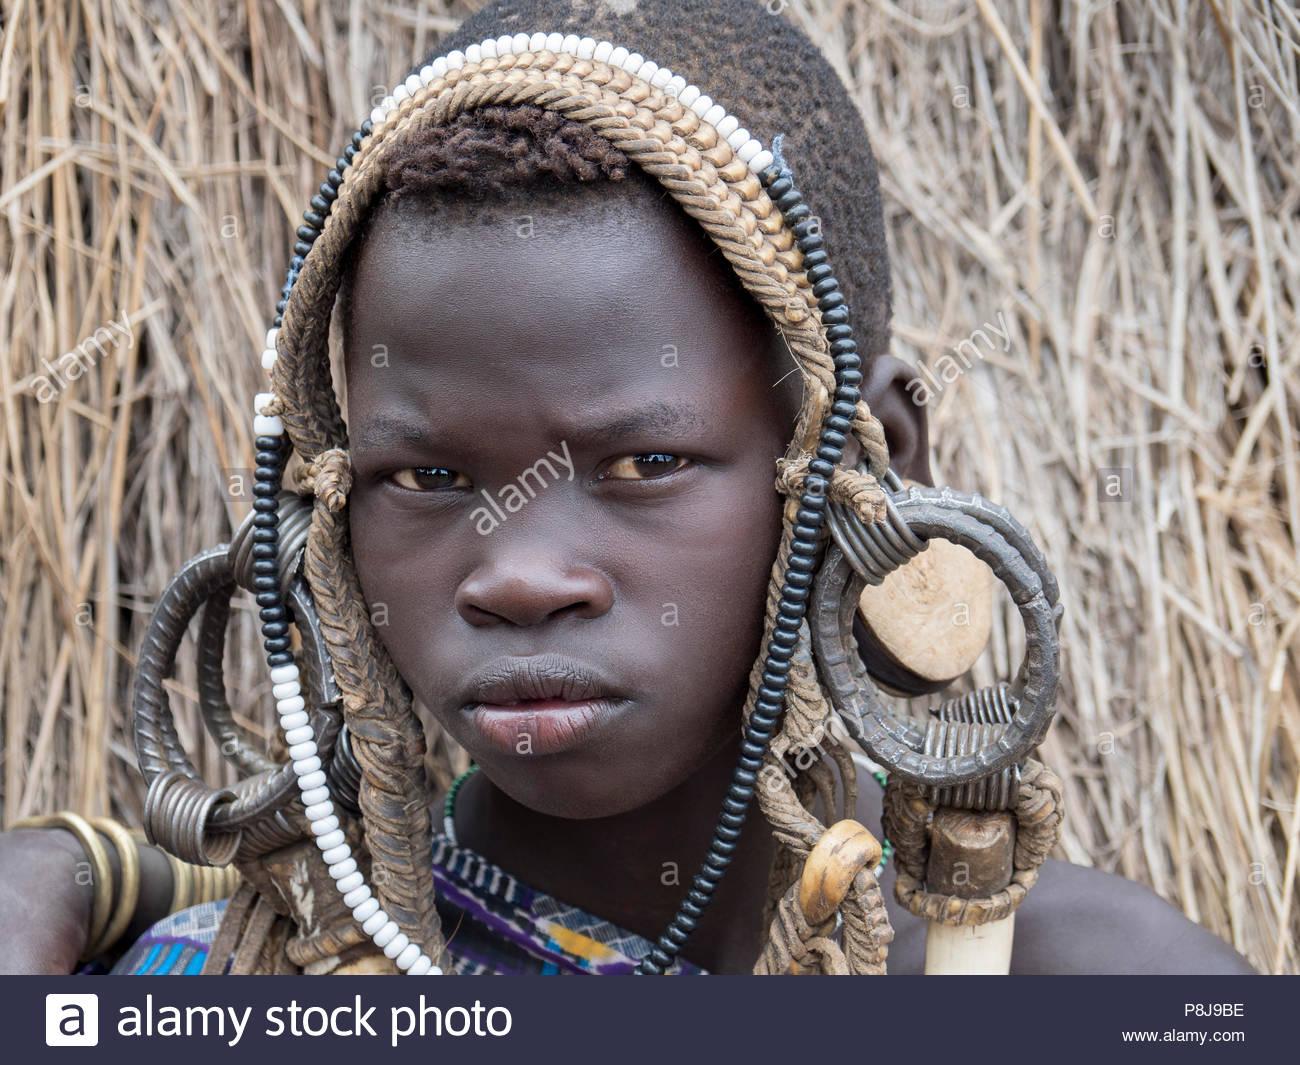 Mursi boy with headdress, portrait, Ethiopia - Stock Image